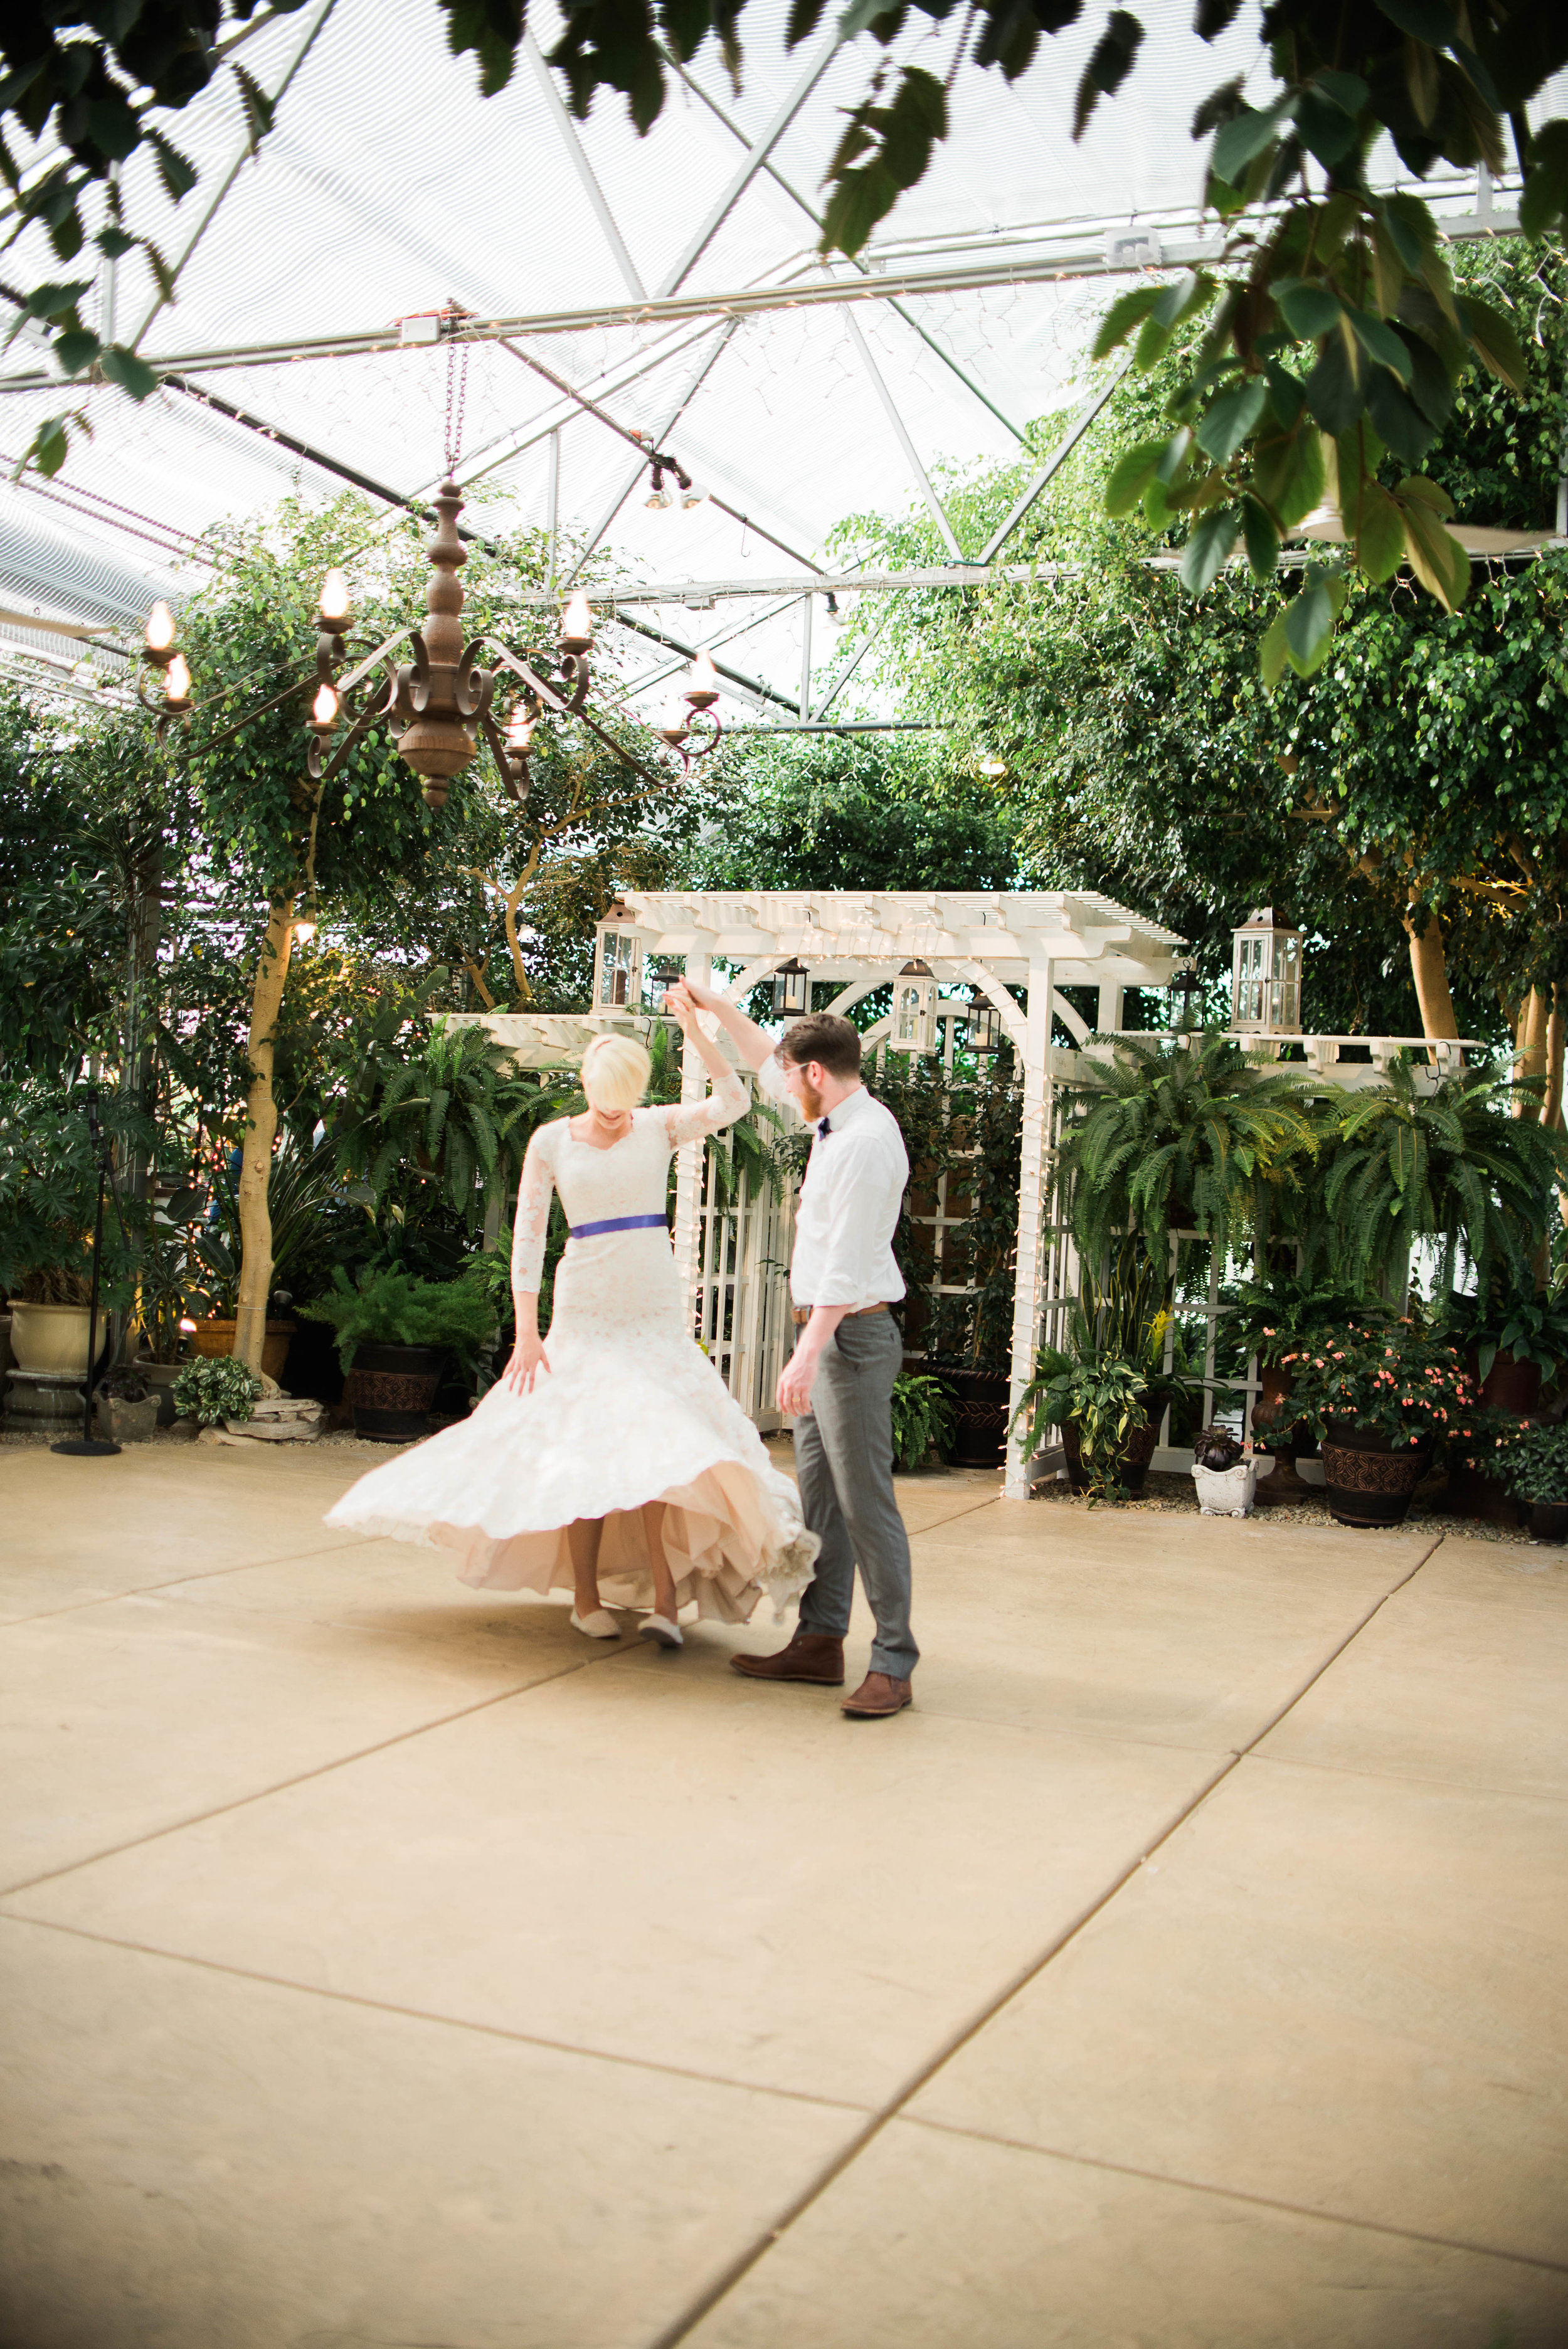 K+M-Wedding-DaySadie_Banks_Photography-877.jpg